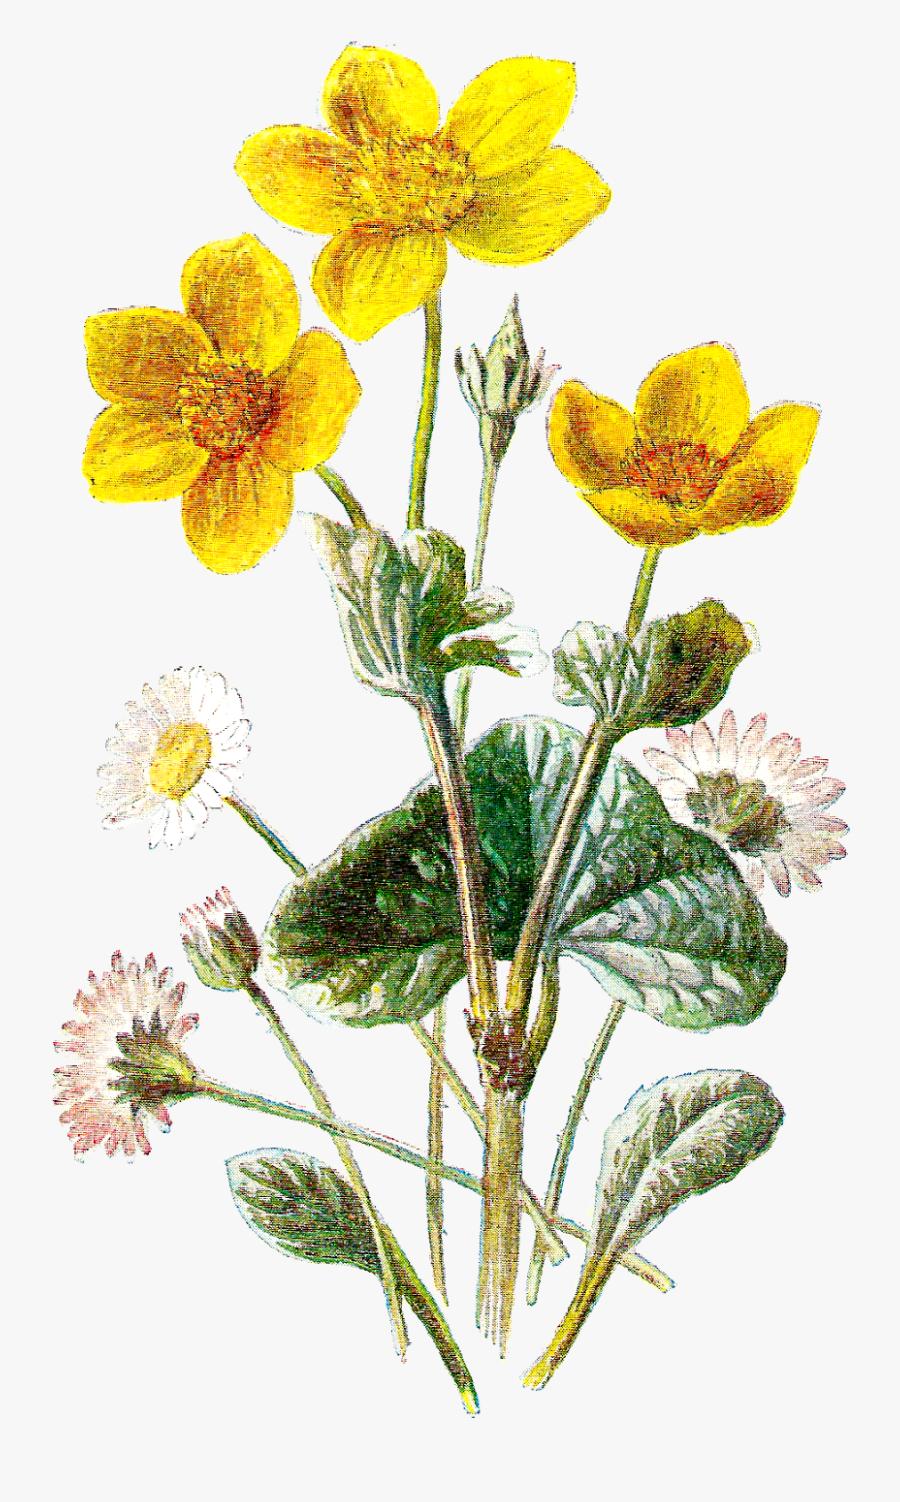 Transparent Botanical Clipart - Marsh Marigold And Daisy, Transparent Clipart